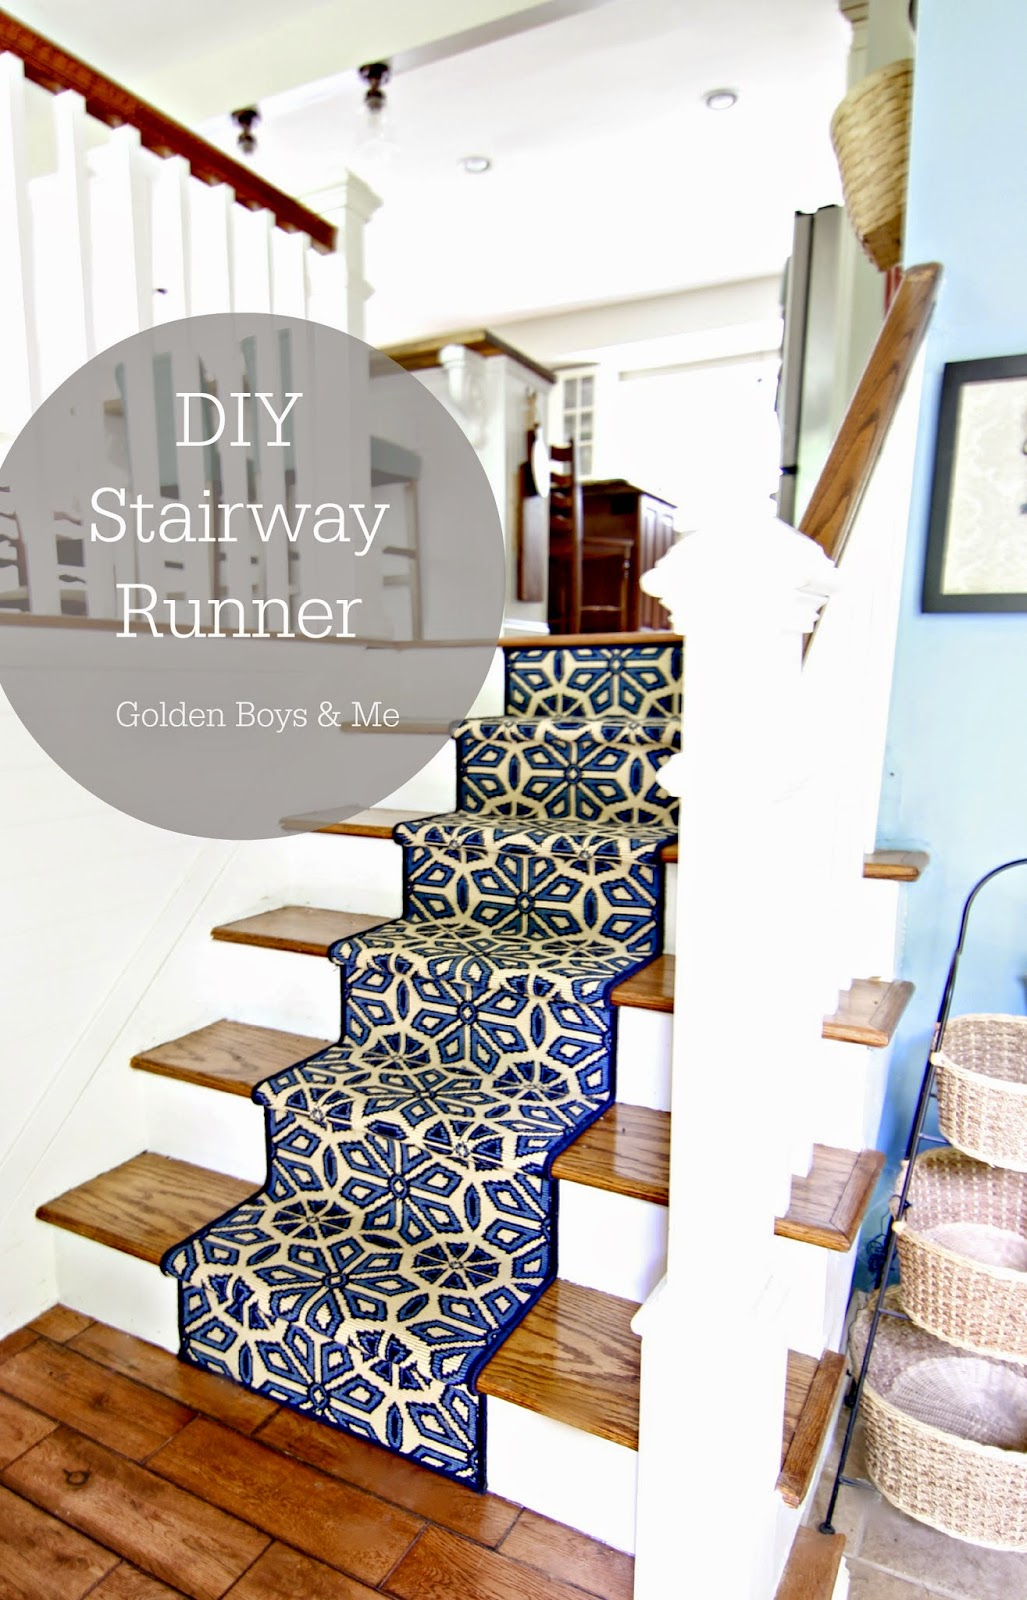 Split Entry Stairway Google Search: Golden Boys And Me: DIY Stair Runner